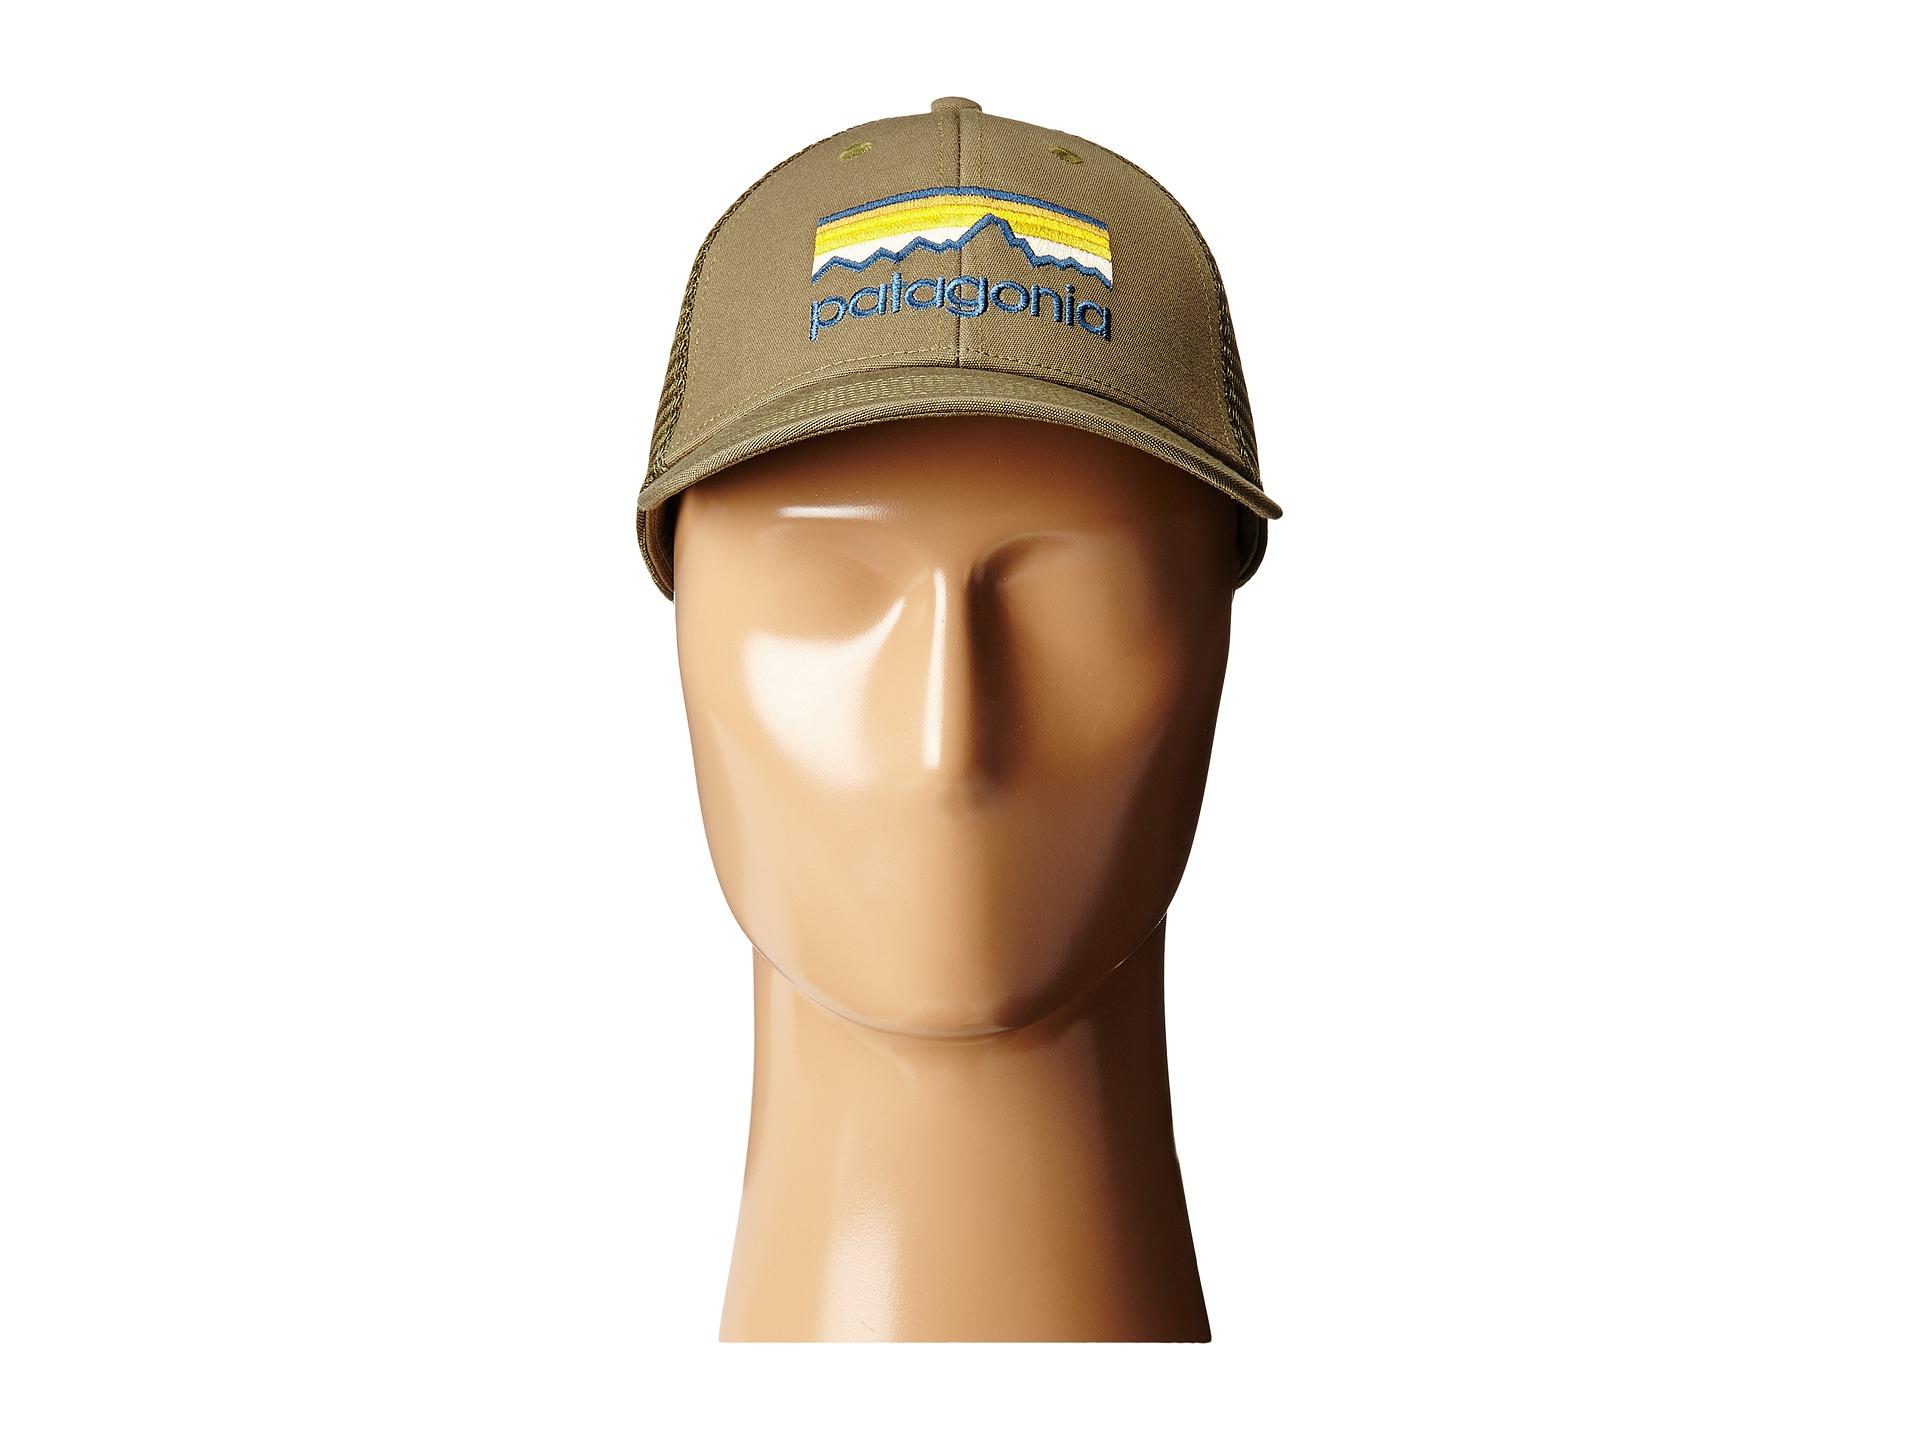 Lyst - Patagonia Line Logo Lopro Trucker Hat in Green 1dfac4bdd89